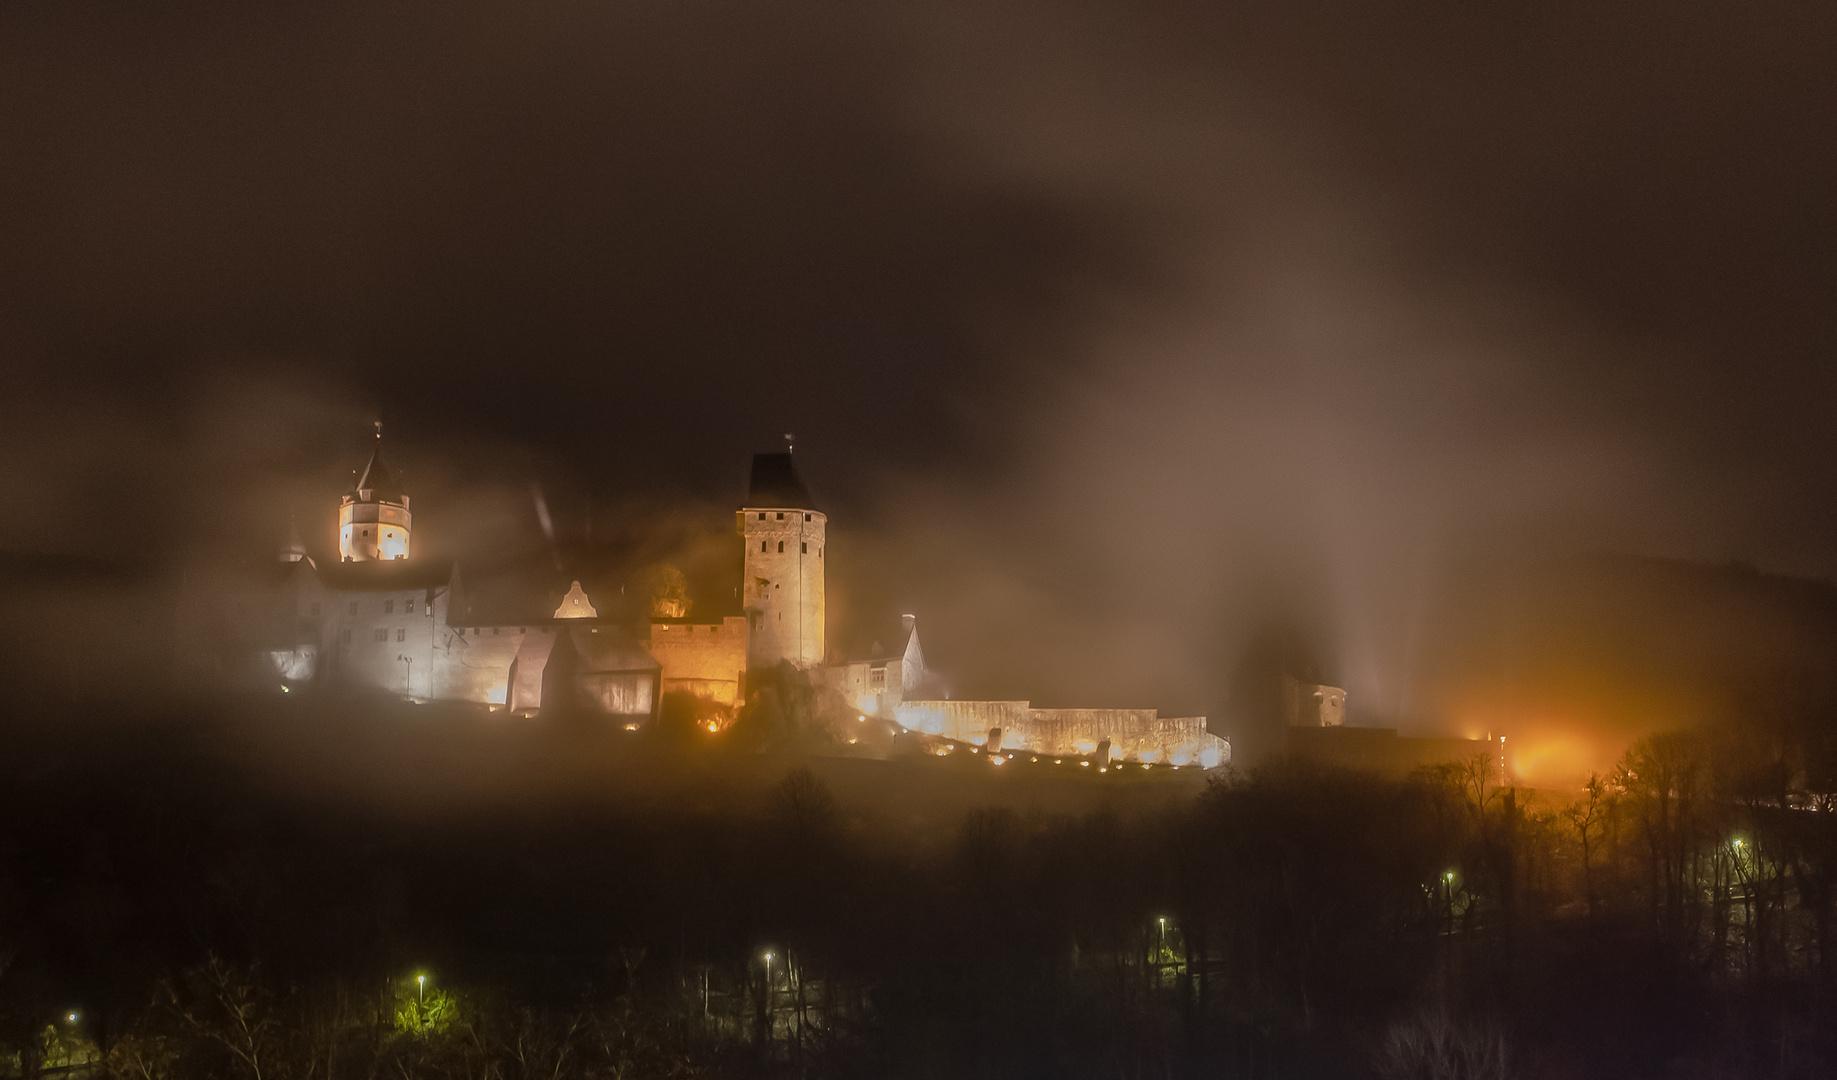 Burg Altena im Nebel / Altena Castle in the fog